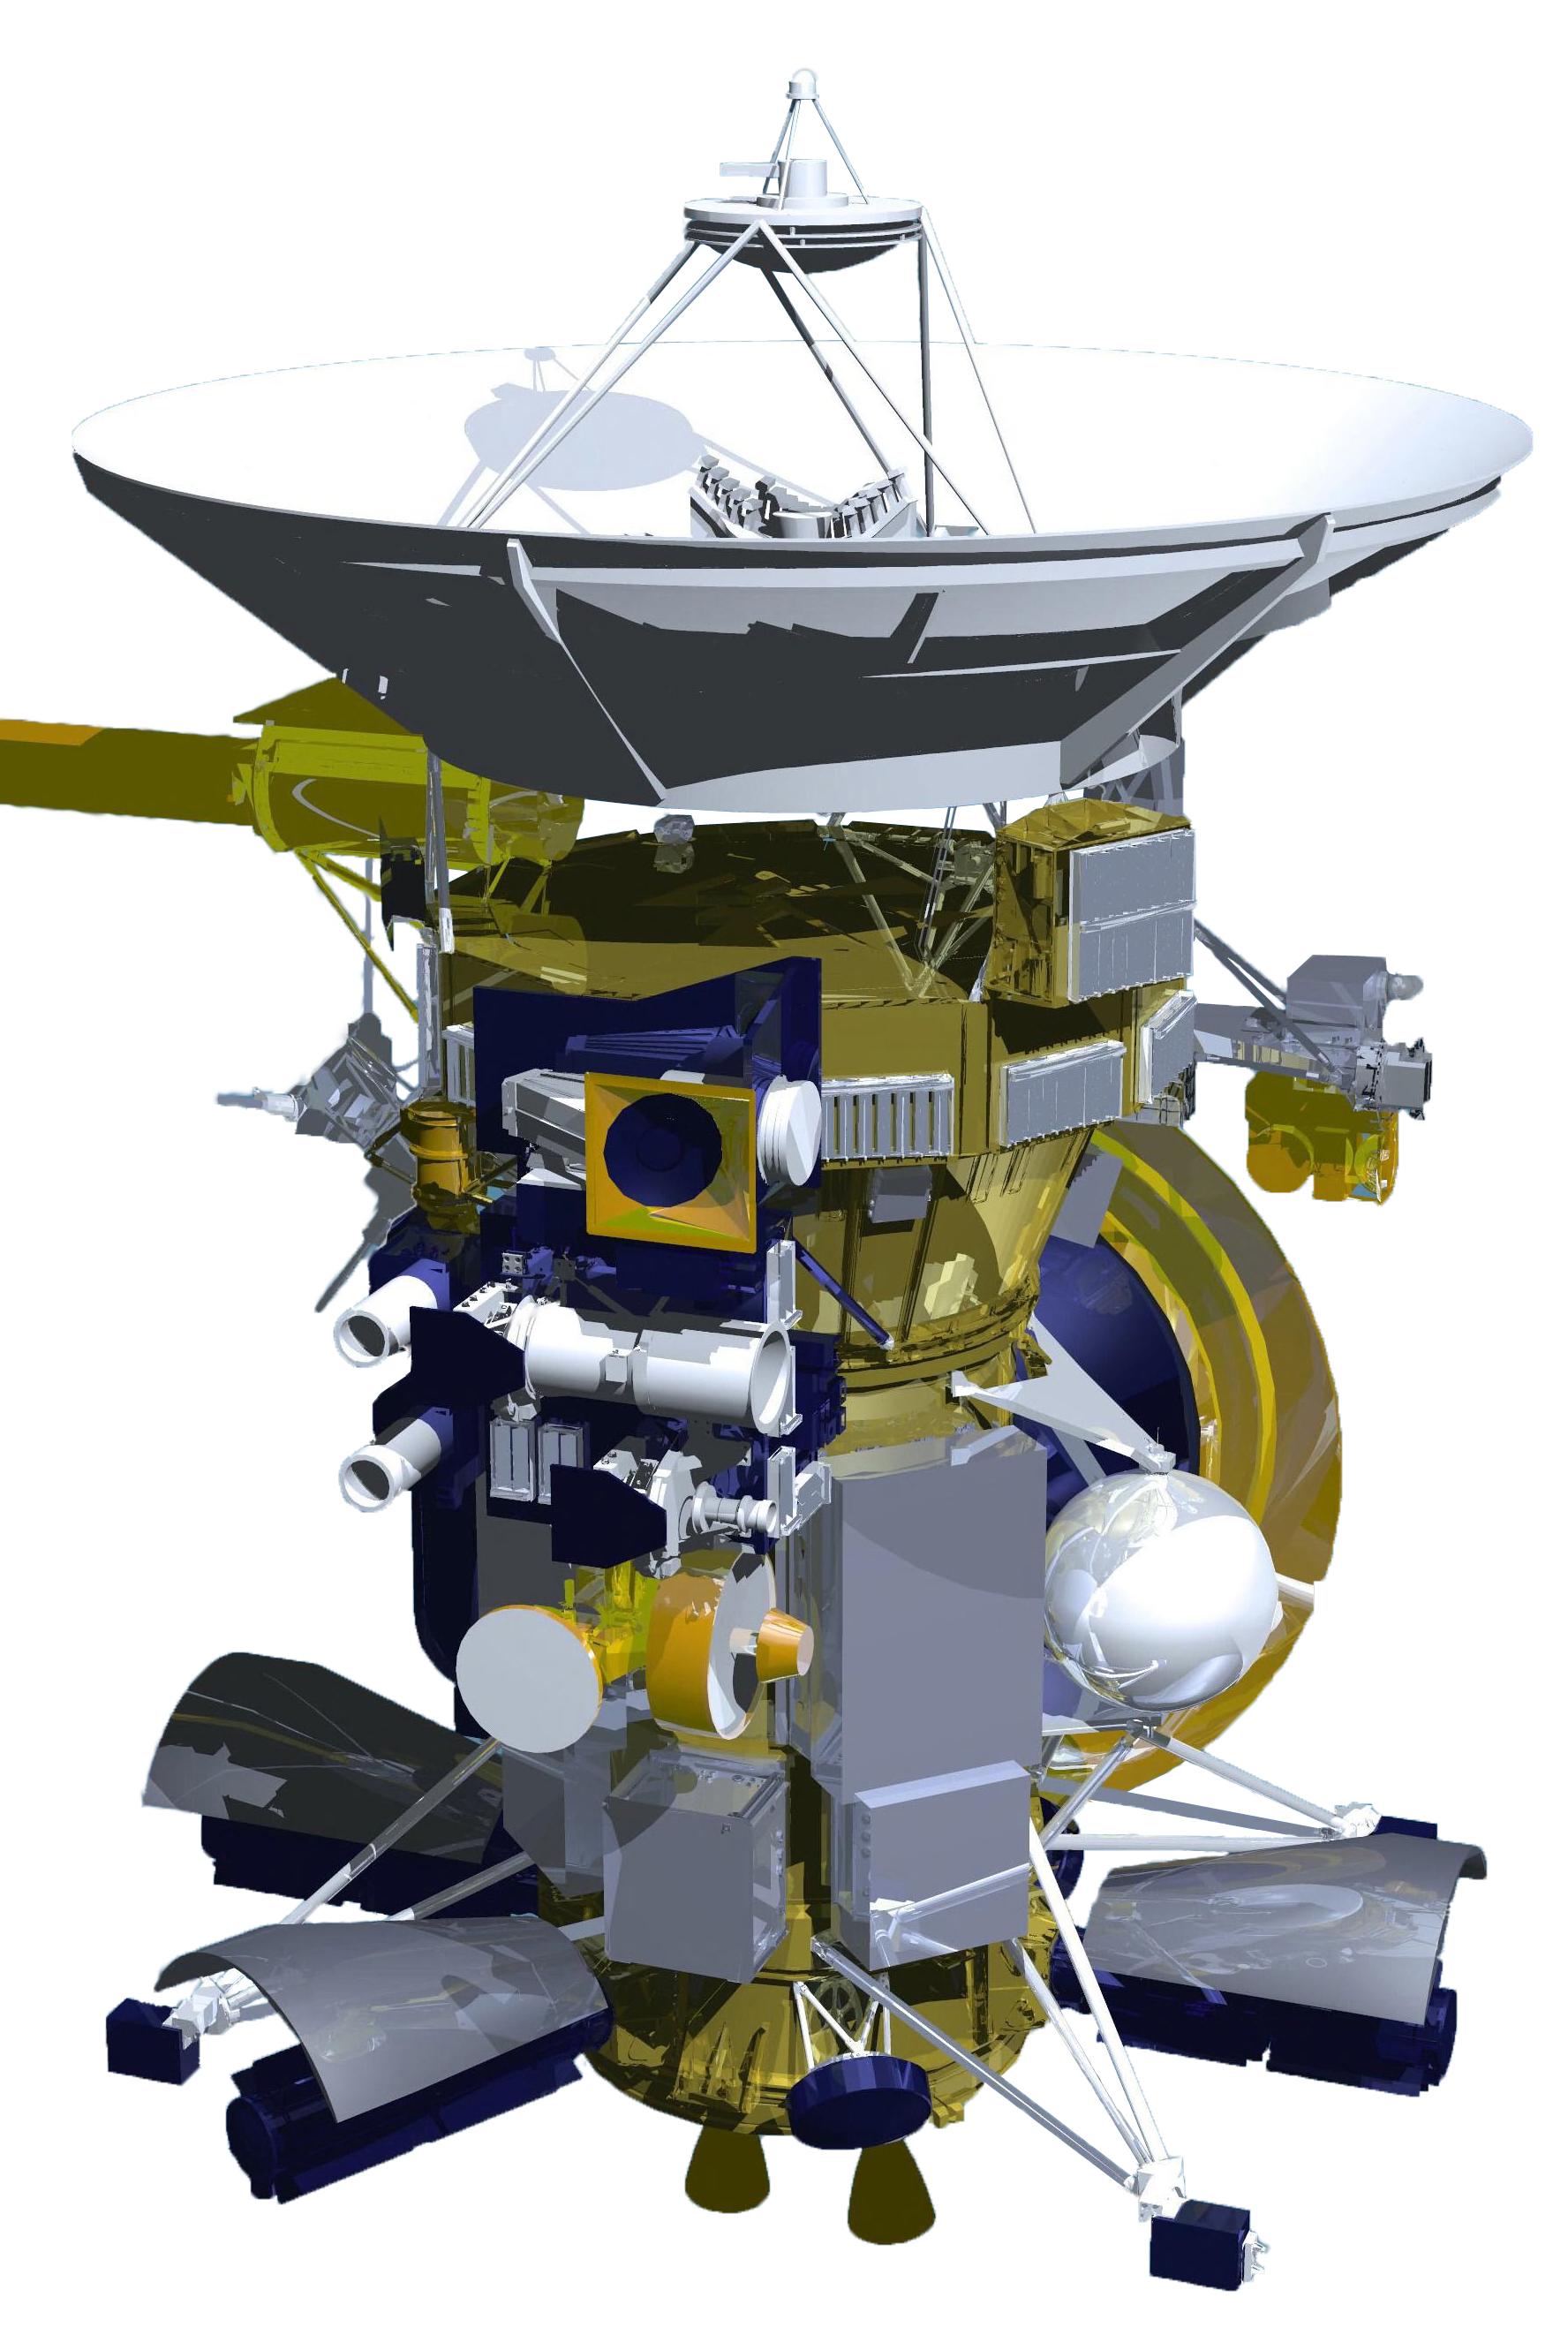 File:Cassini spacecraft raw uncompressed.png.